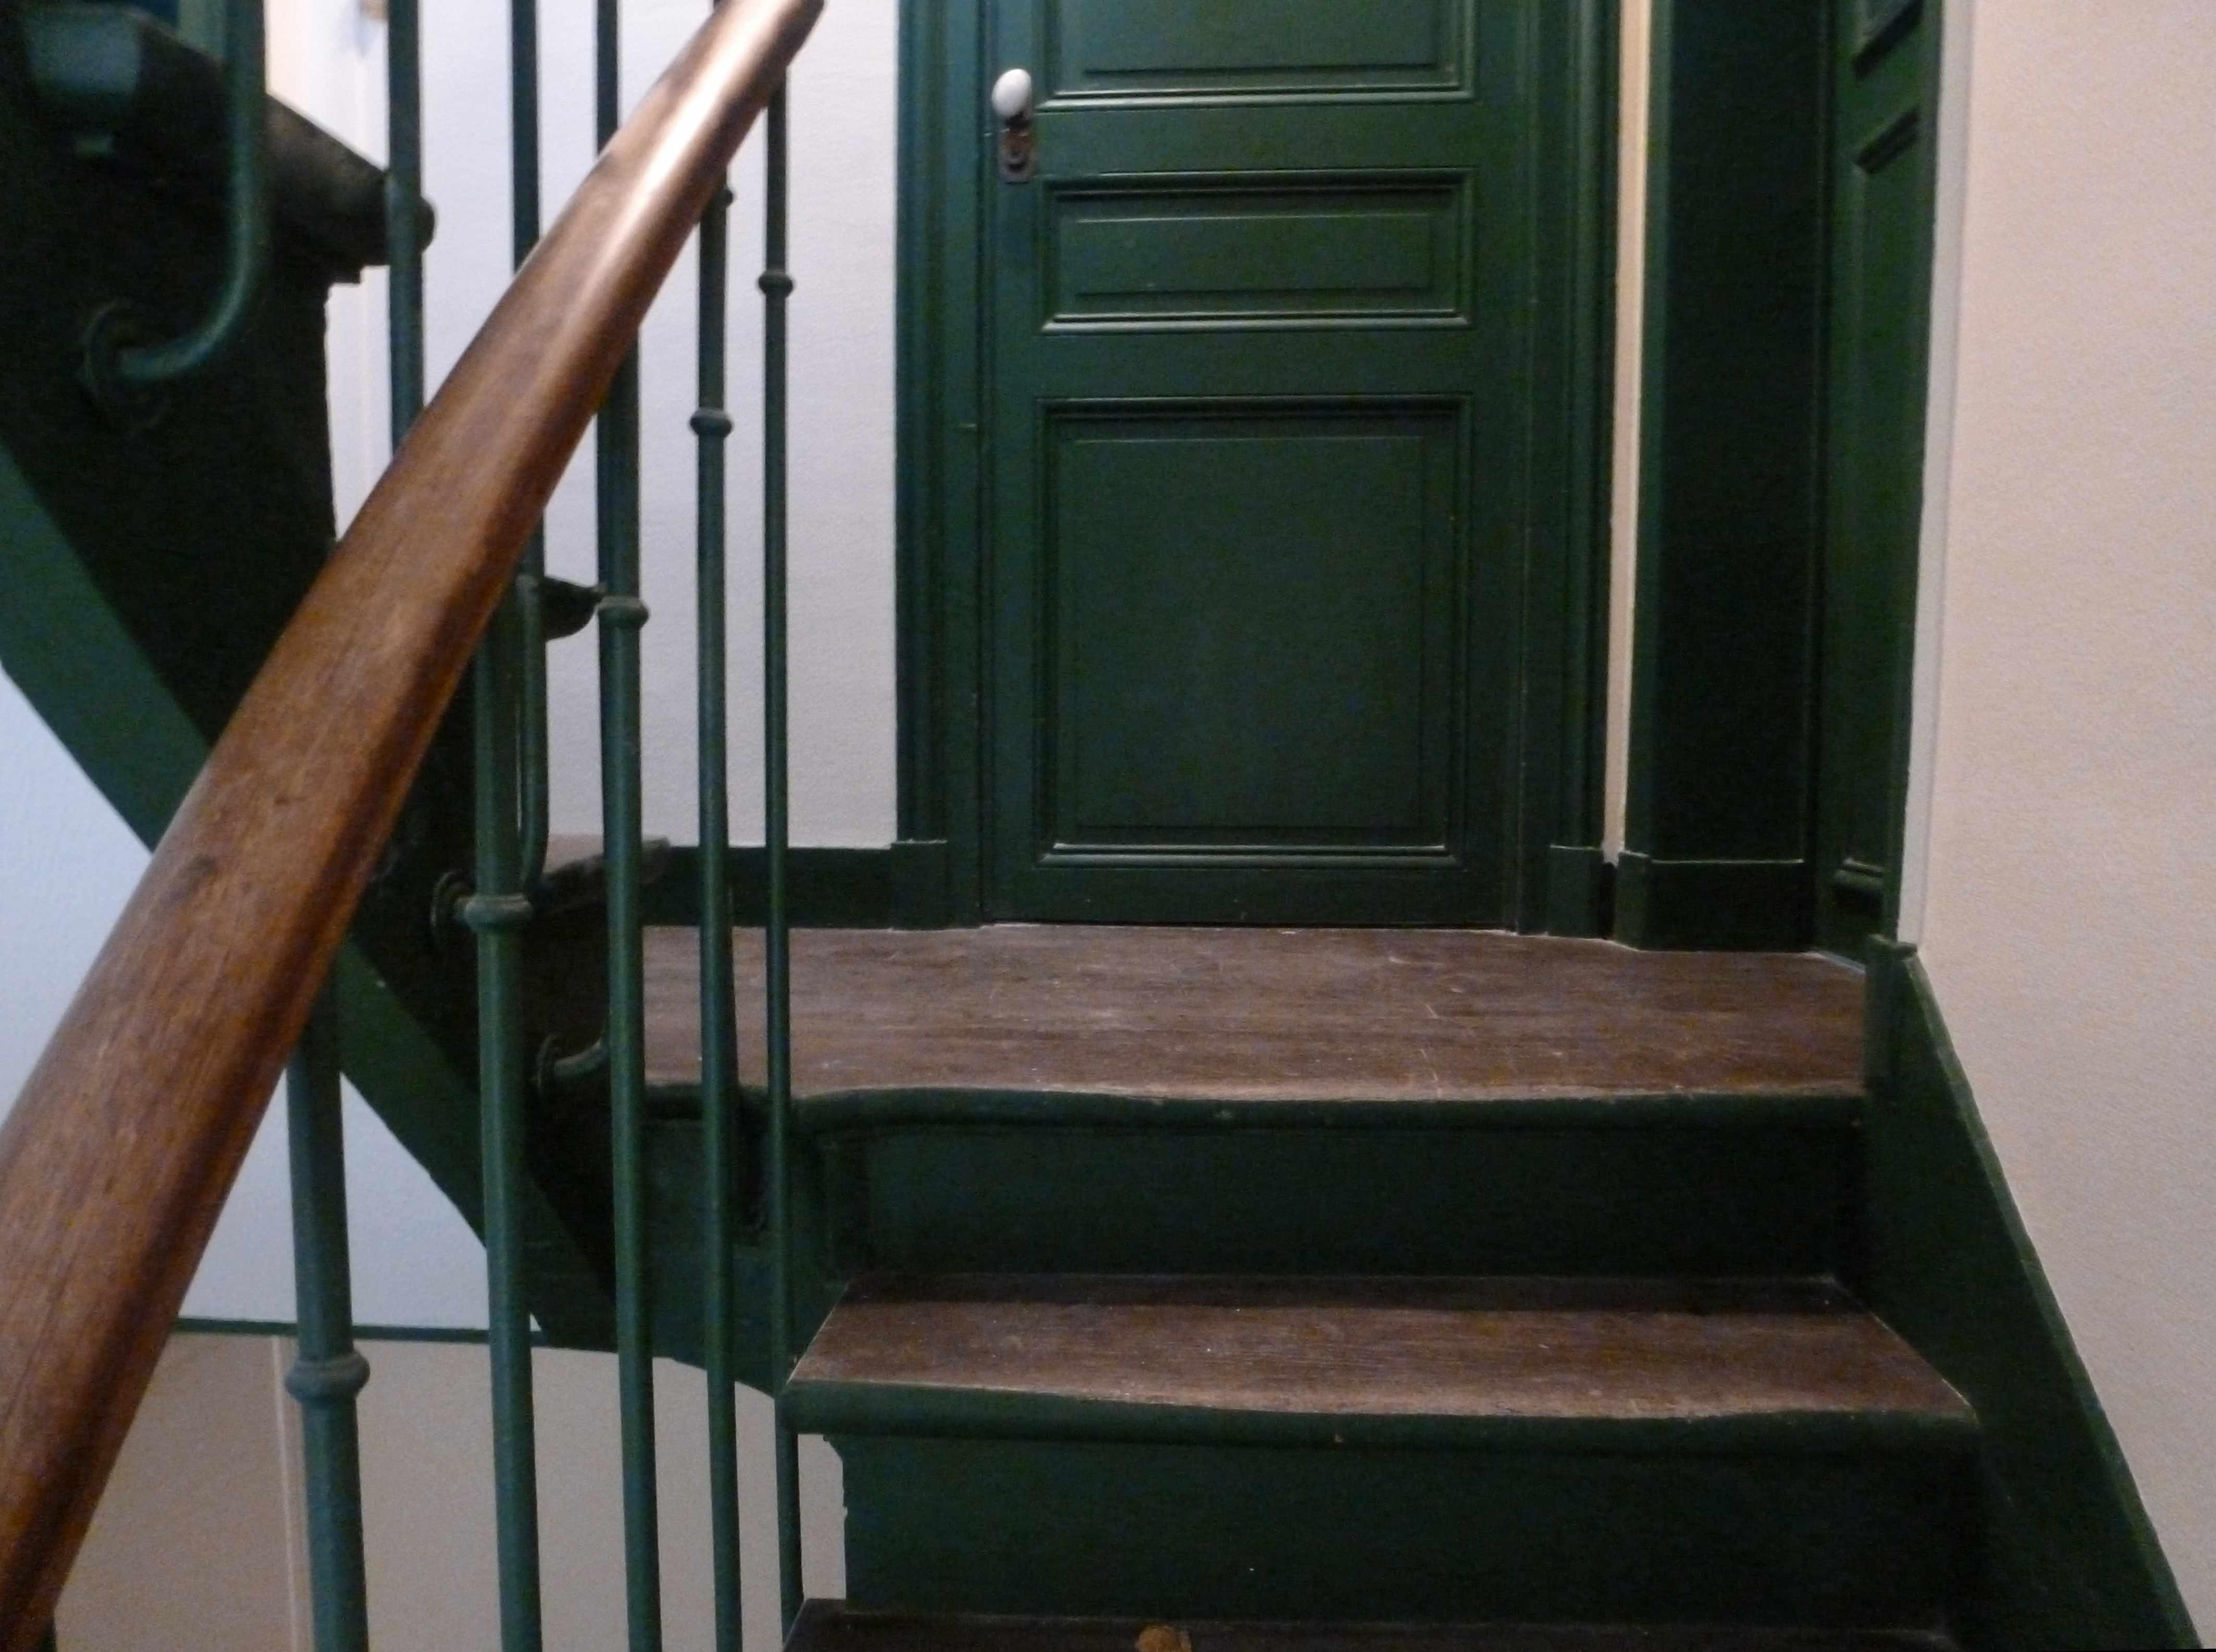 Escalier for Peinture cage escalier immeuble